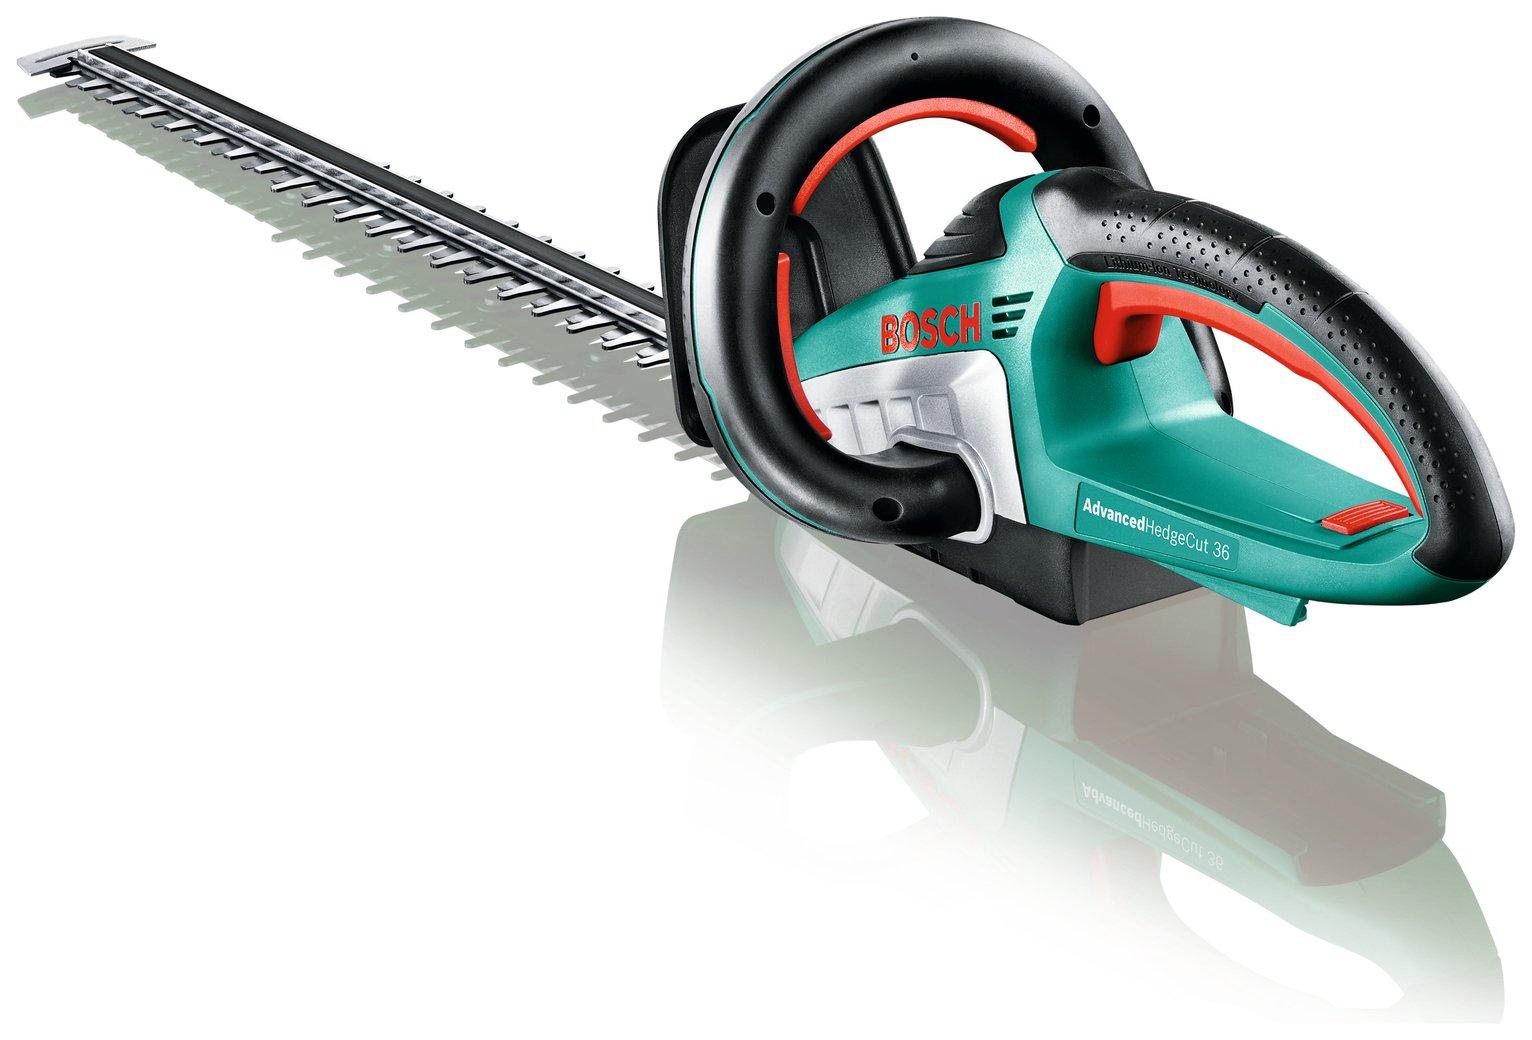 Bosch AdvandedHedgeCut 36 Cordless Hedge cutter - No Battery